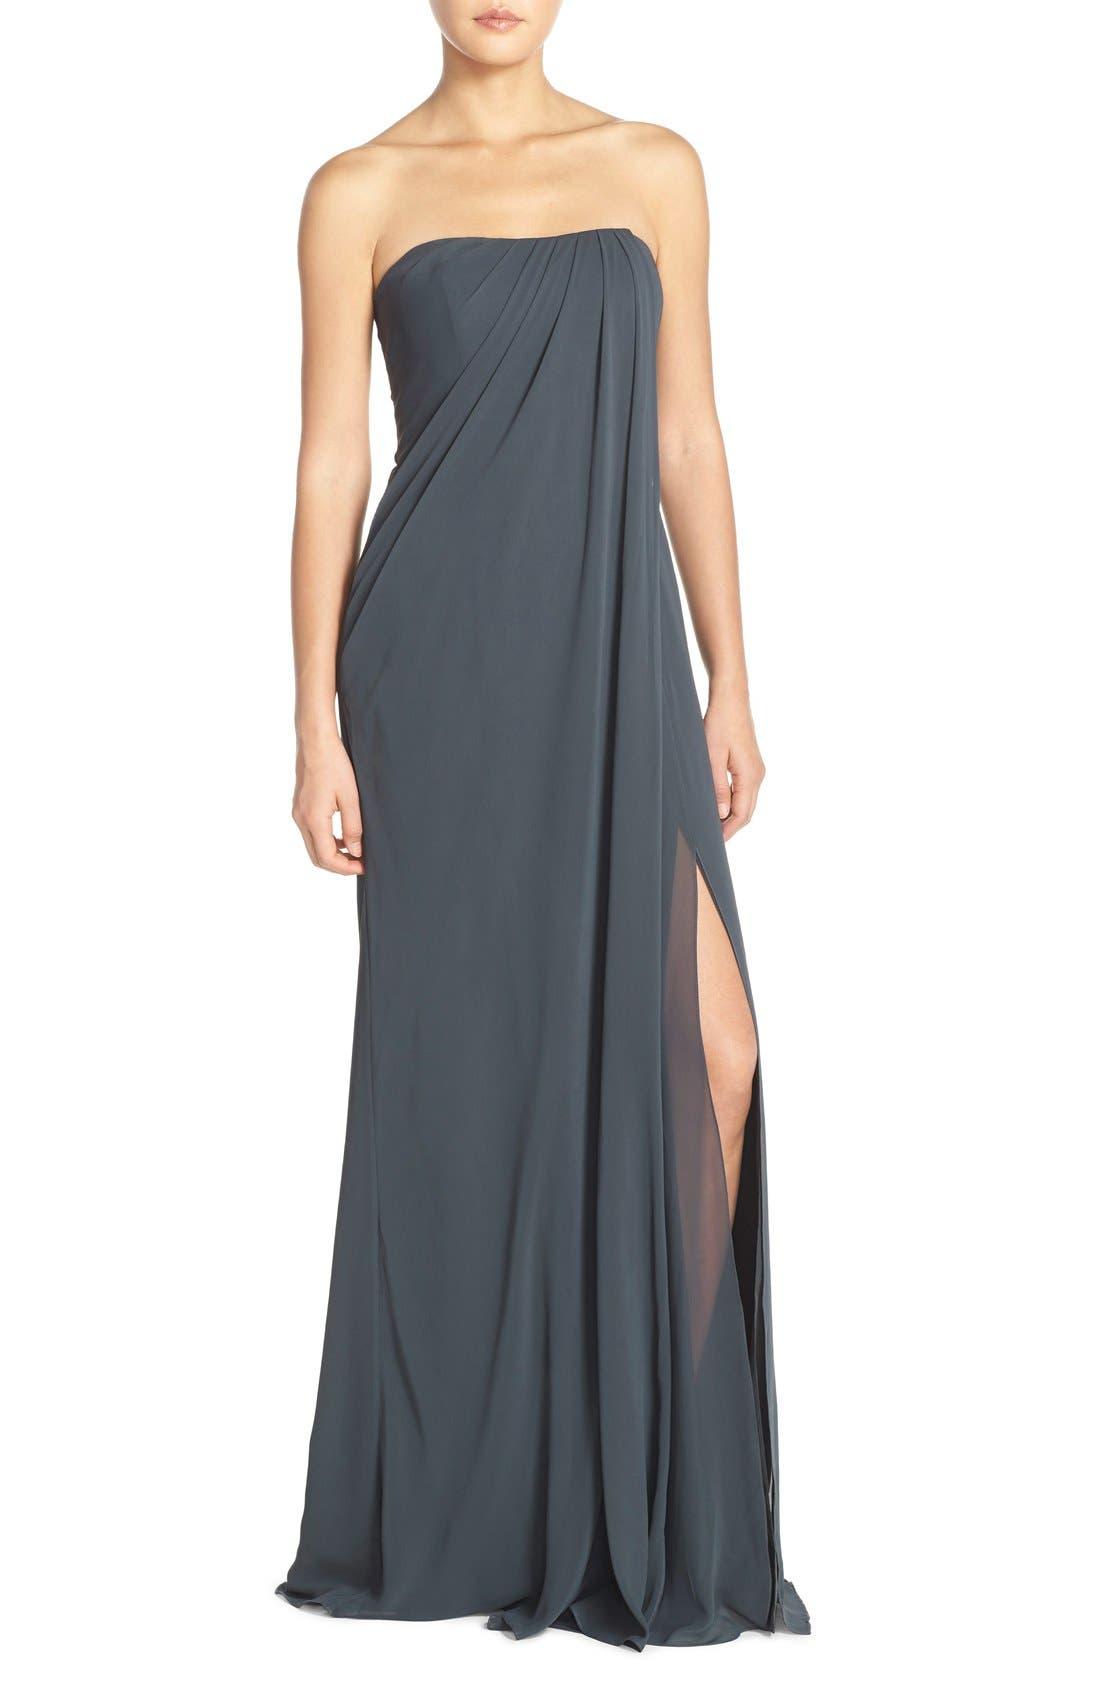 Raquel Front Slit Strapless Chiffon Gown,                             Main thumbnail 1, color,                             026